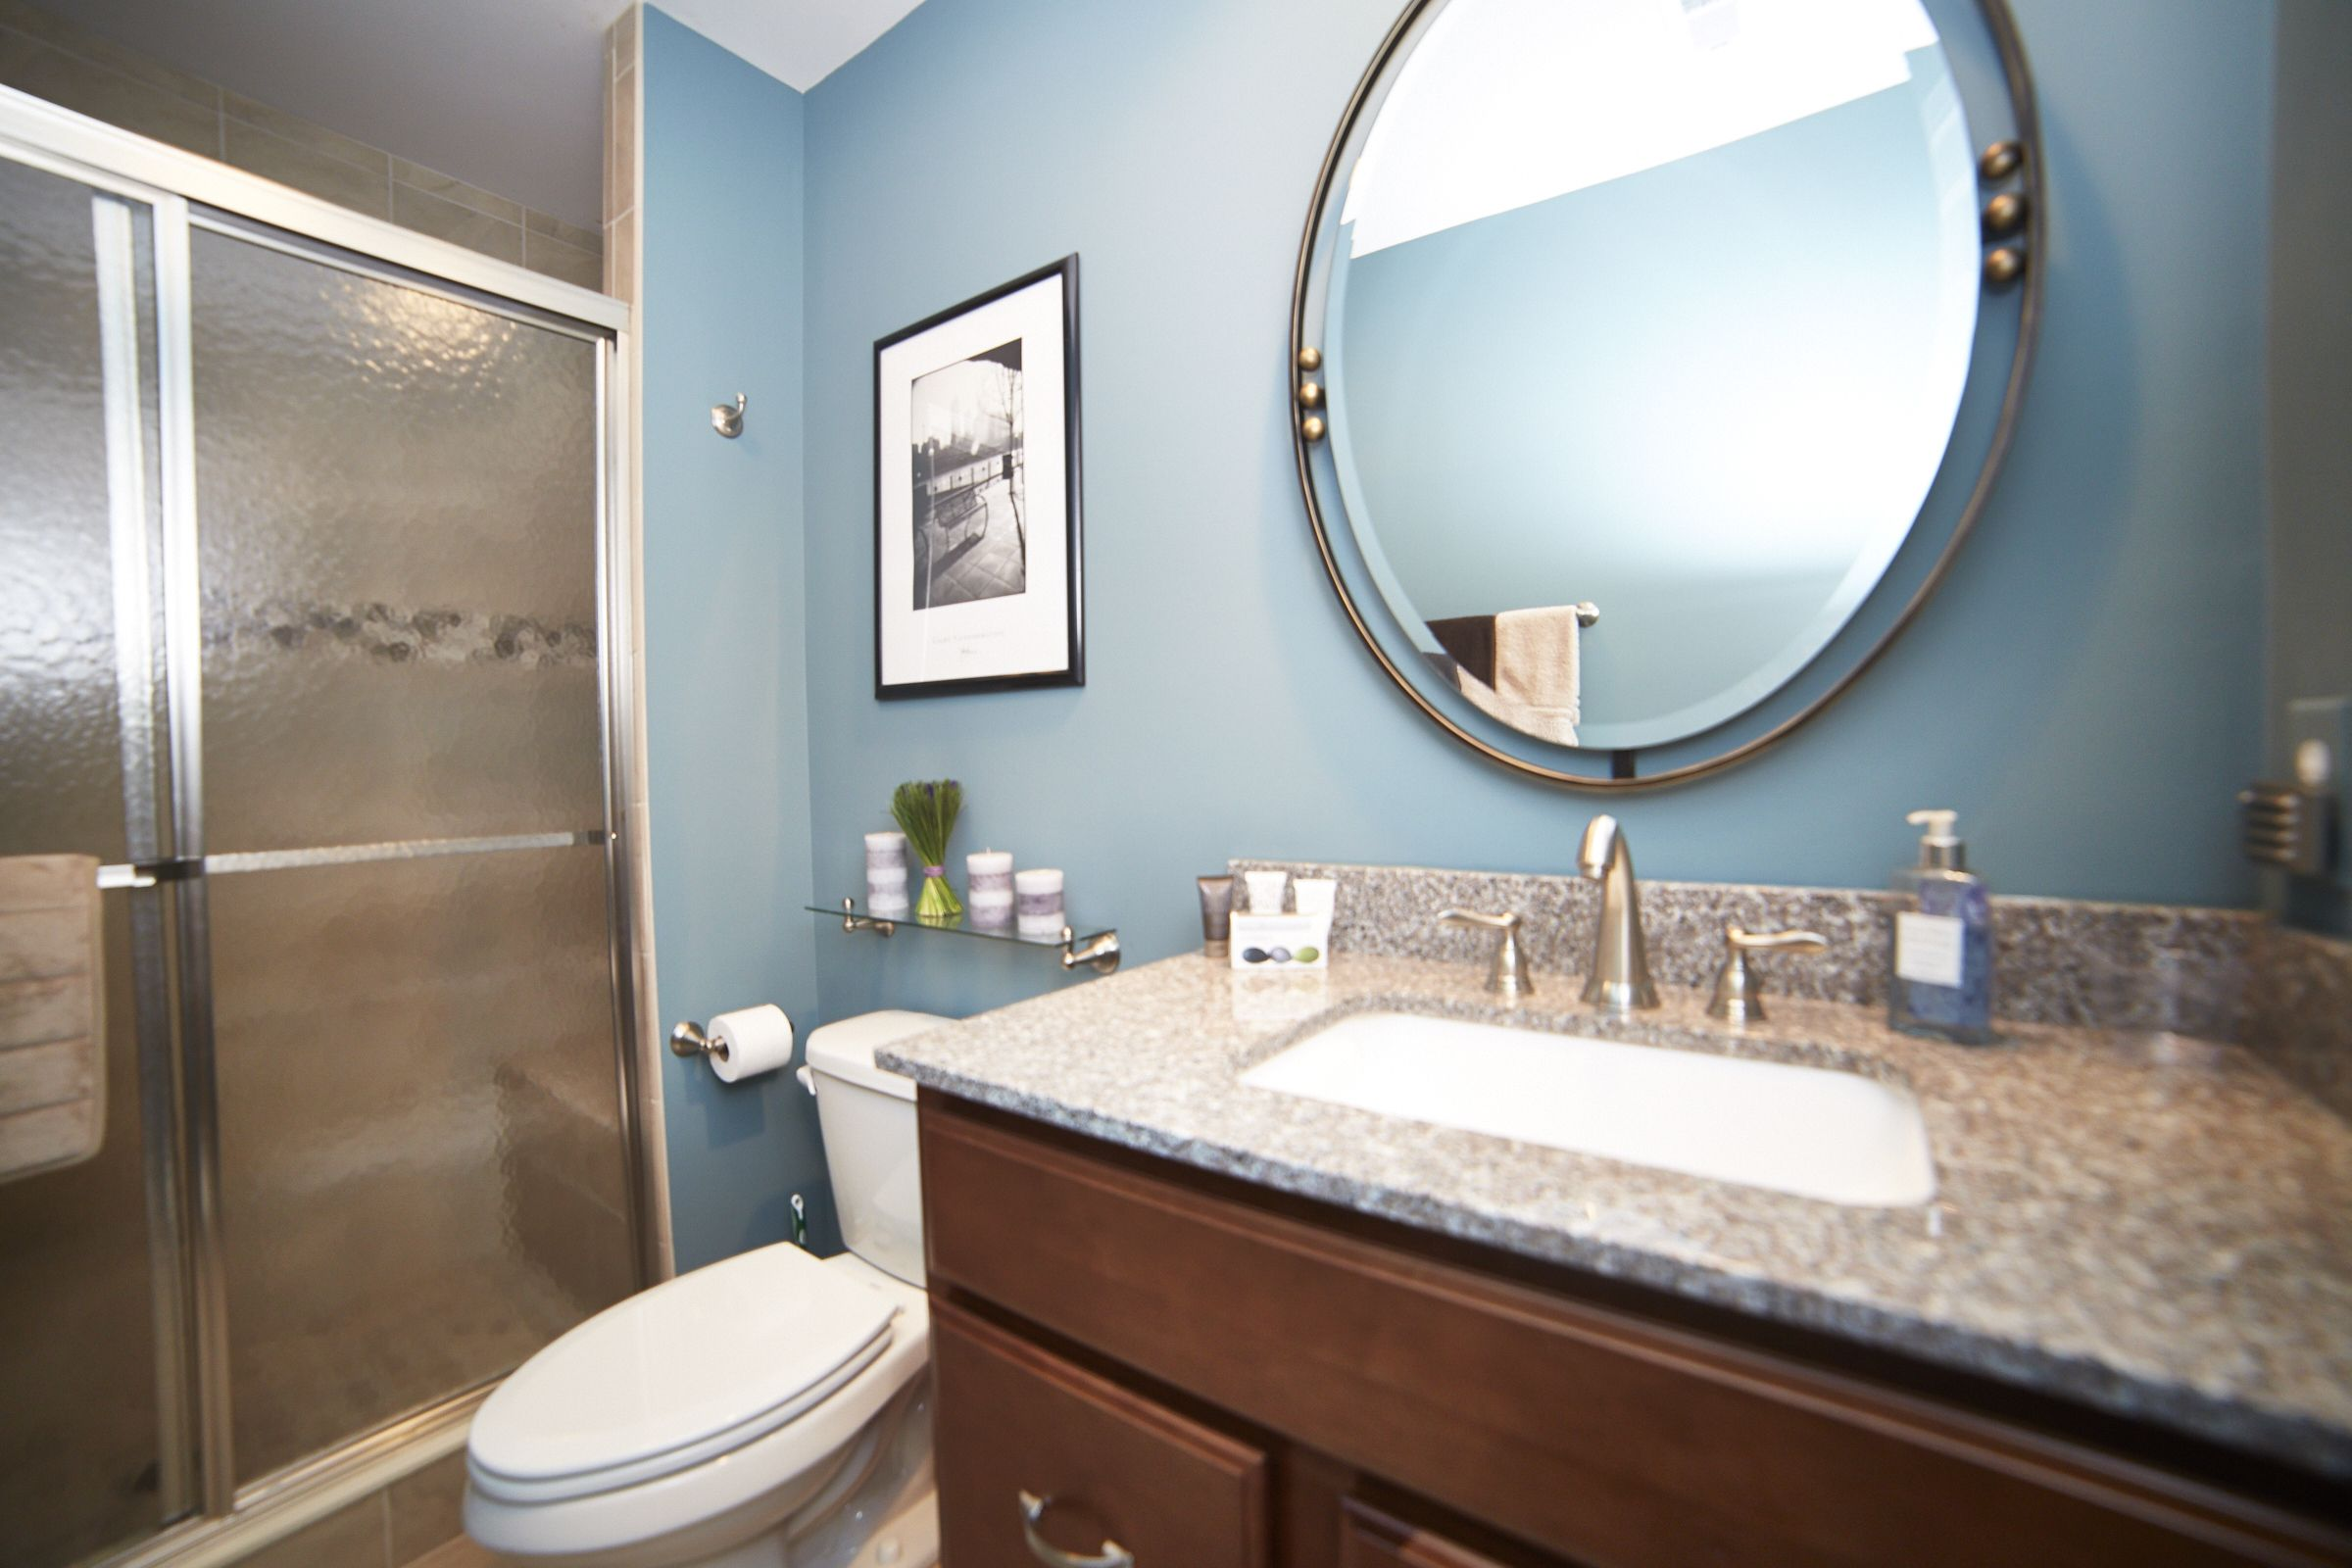 www.facebook.com/wpsdecorating for all interior design inspirations ...